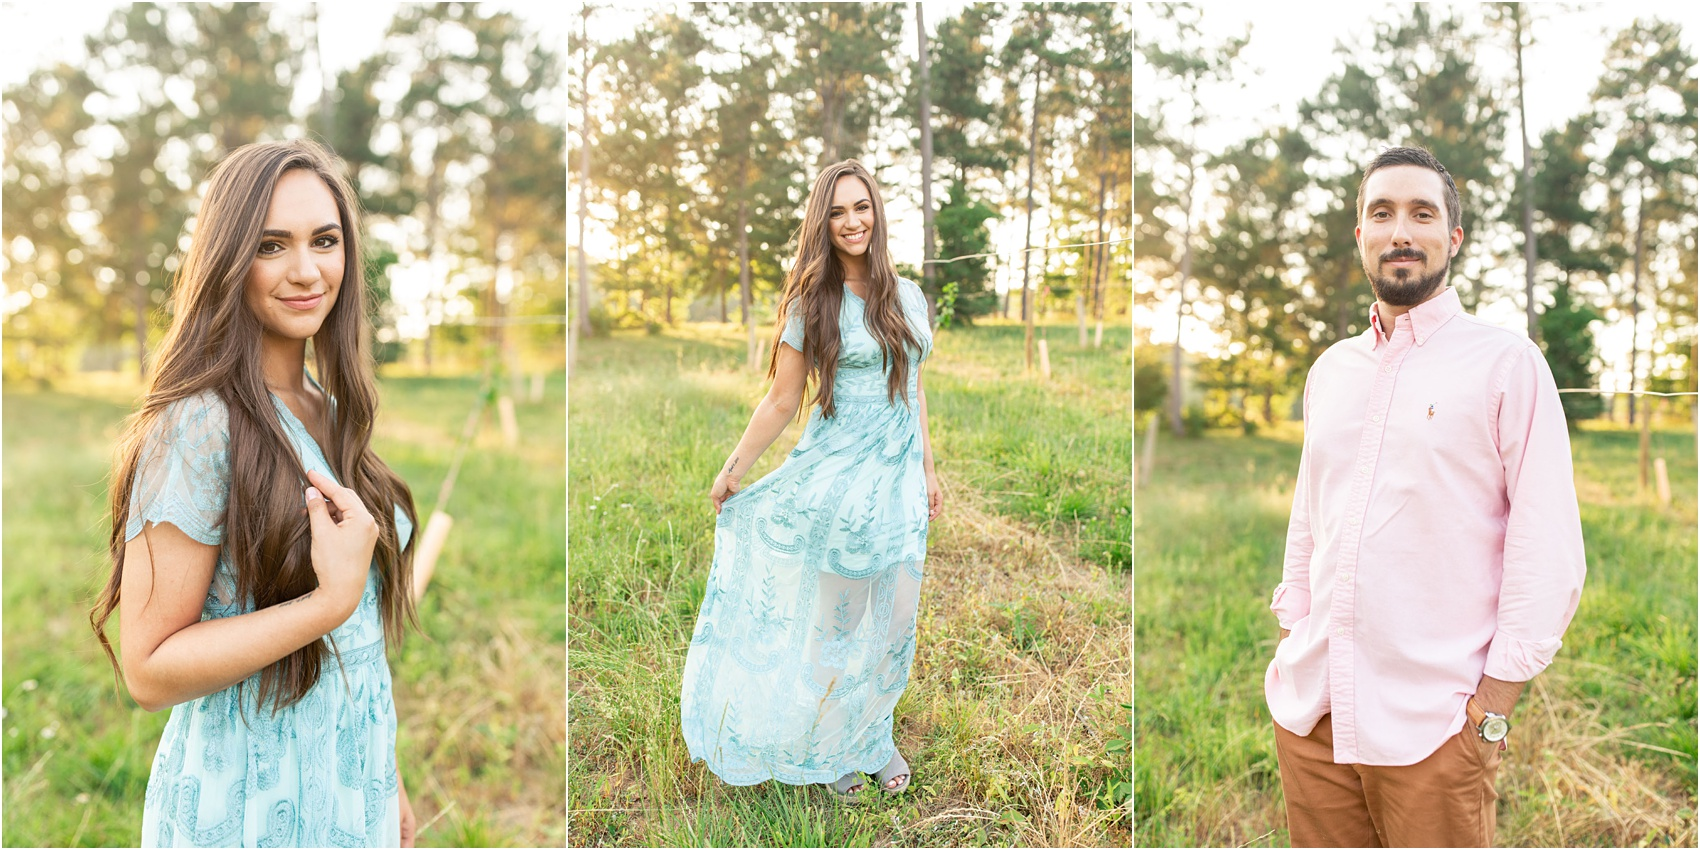 Savannah Eve Photography LLC- Tiffani & Josh Beck @ The Walters Barn- Blog-17.jpg